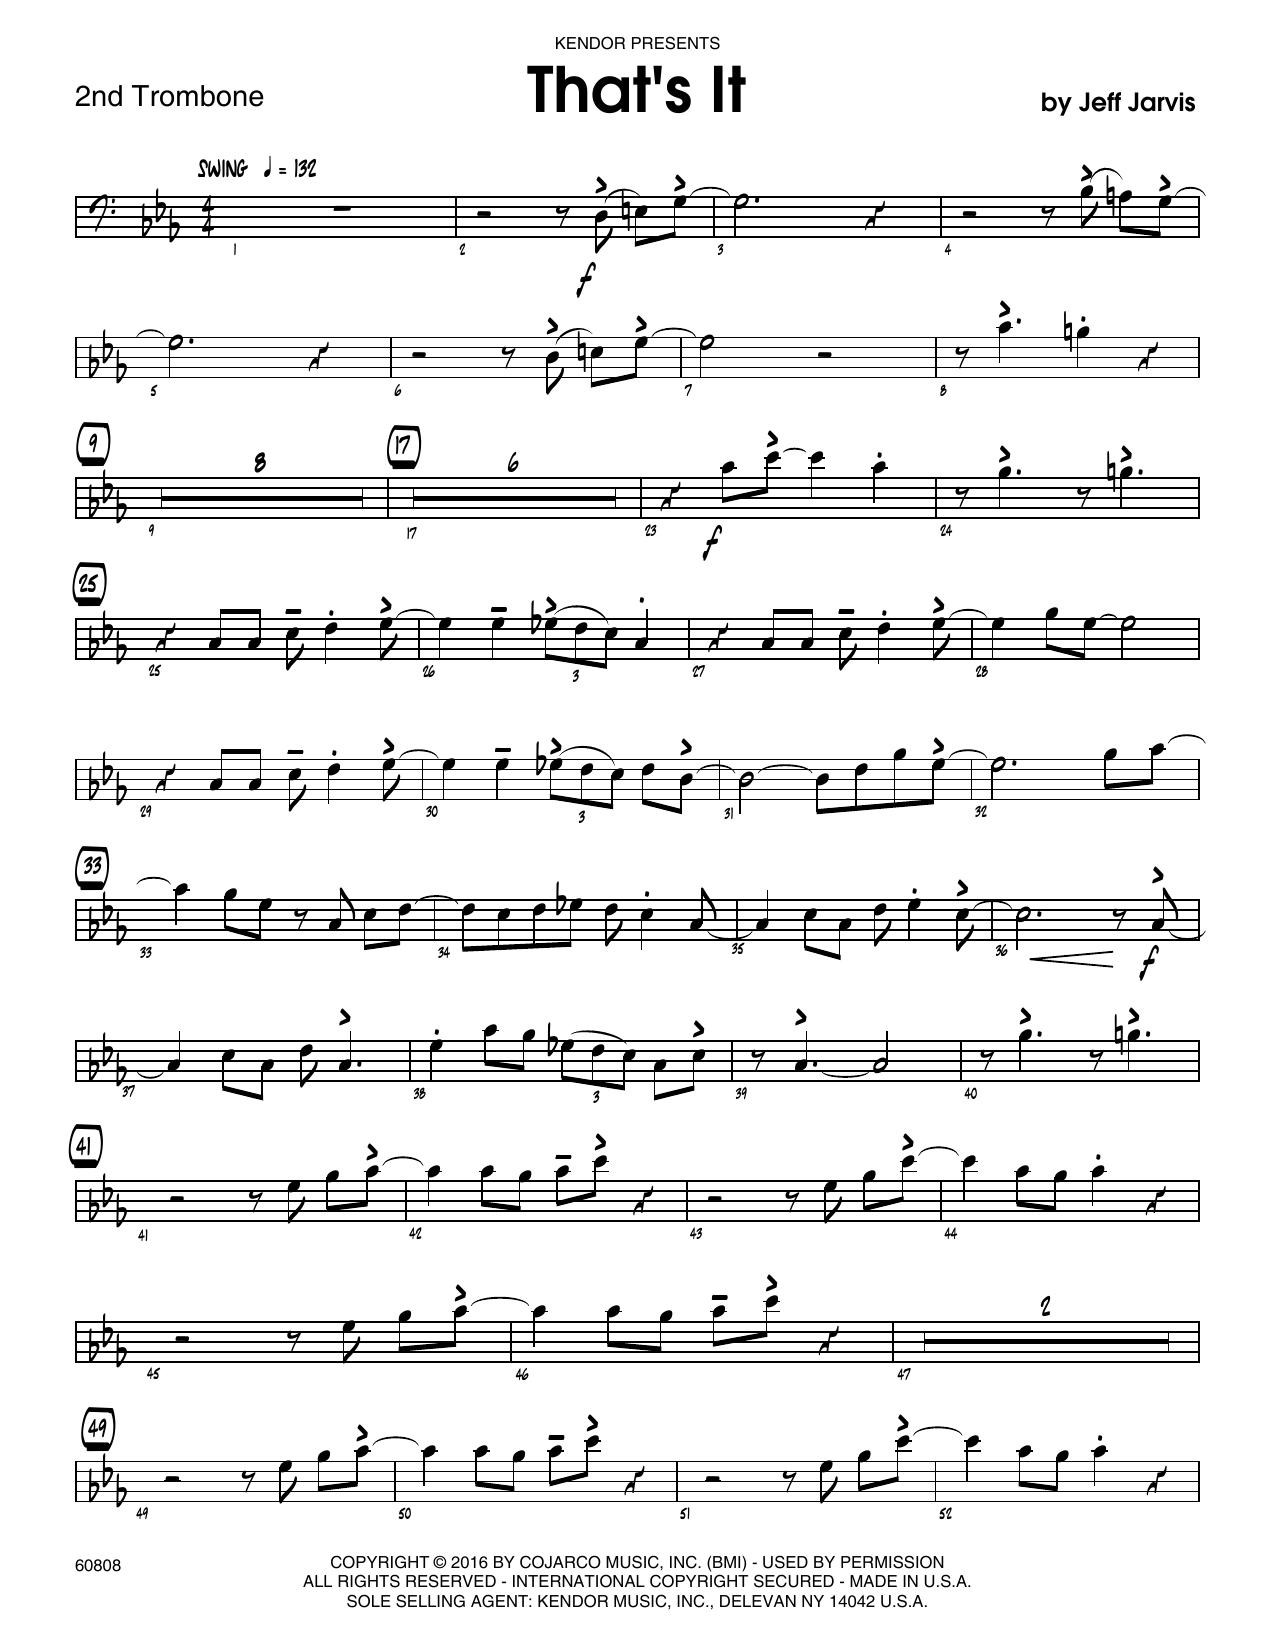 That's It - 2nd Trombone Sheet Music